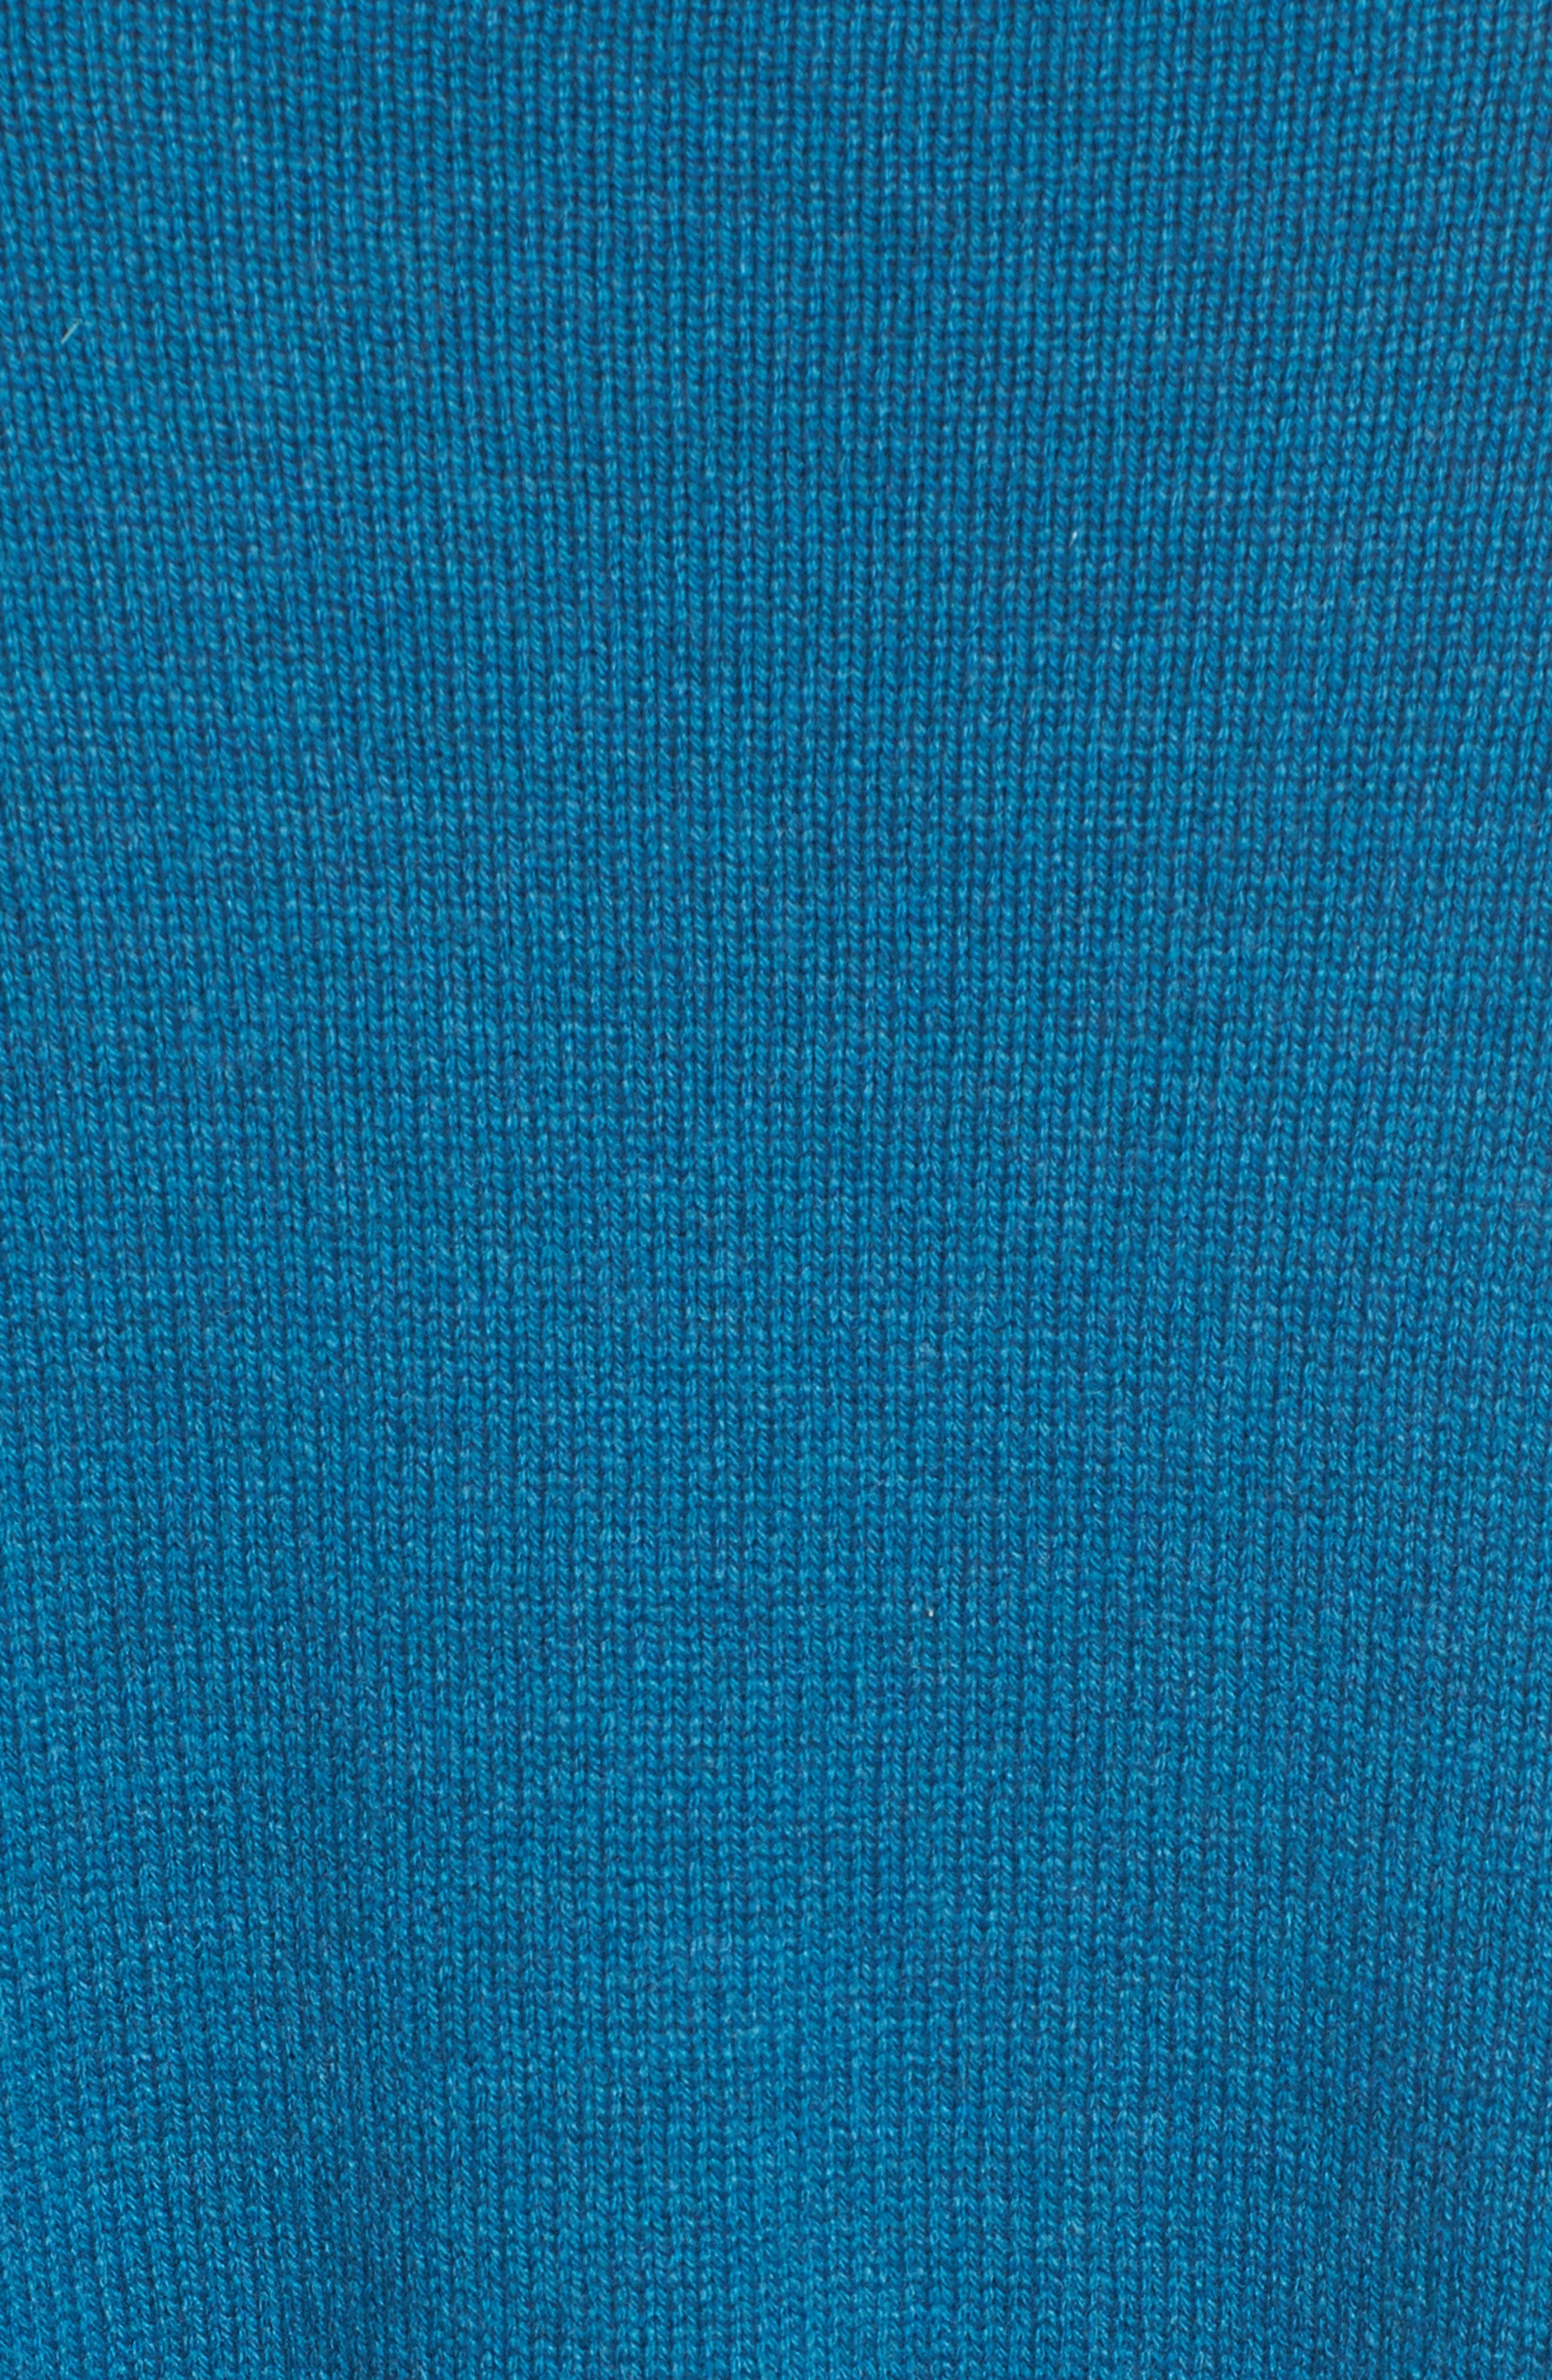 Alternate Image 3  - Eileen Fisher Cashmere & Wool Blend Oversize Sweater